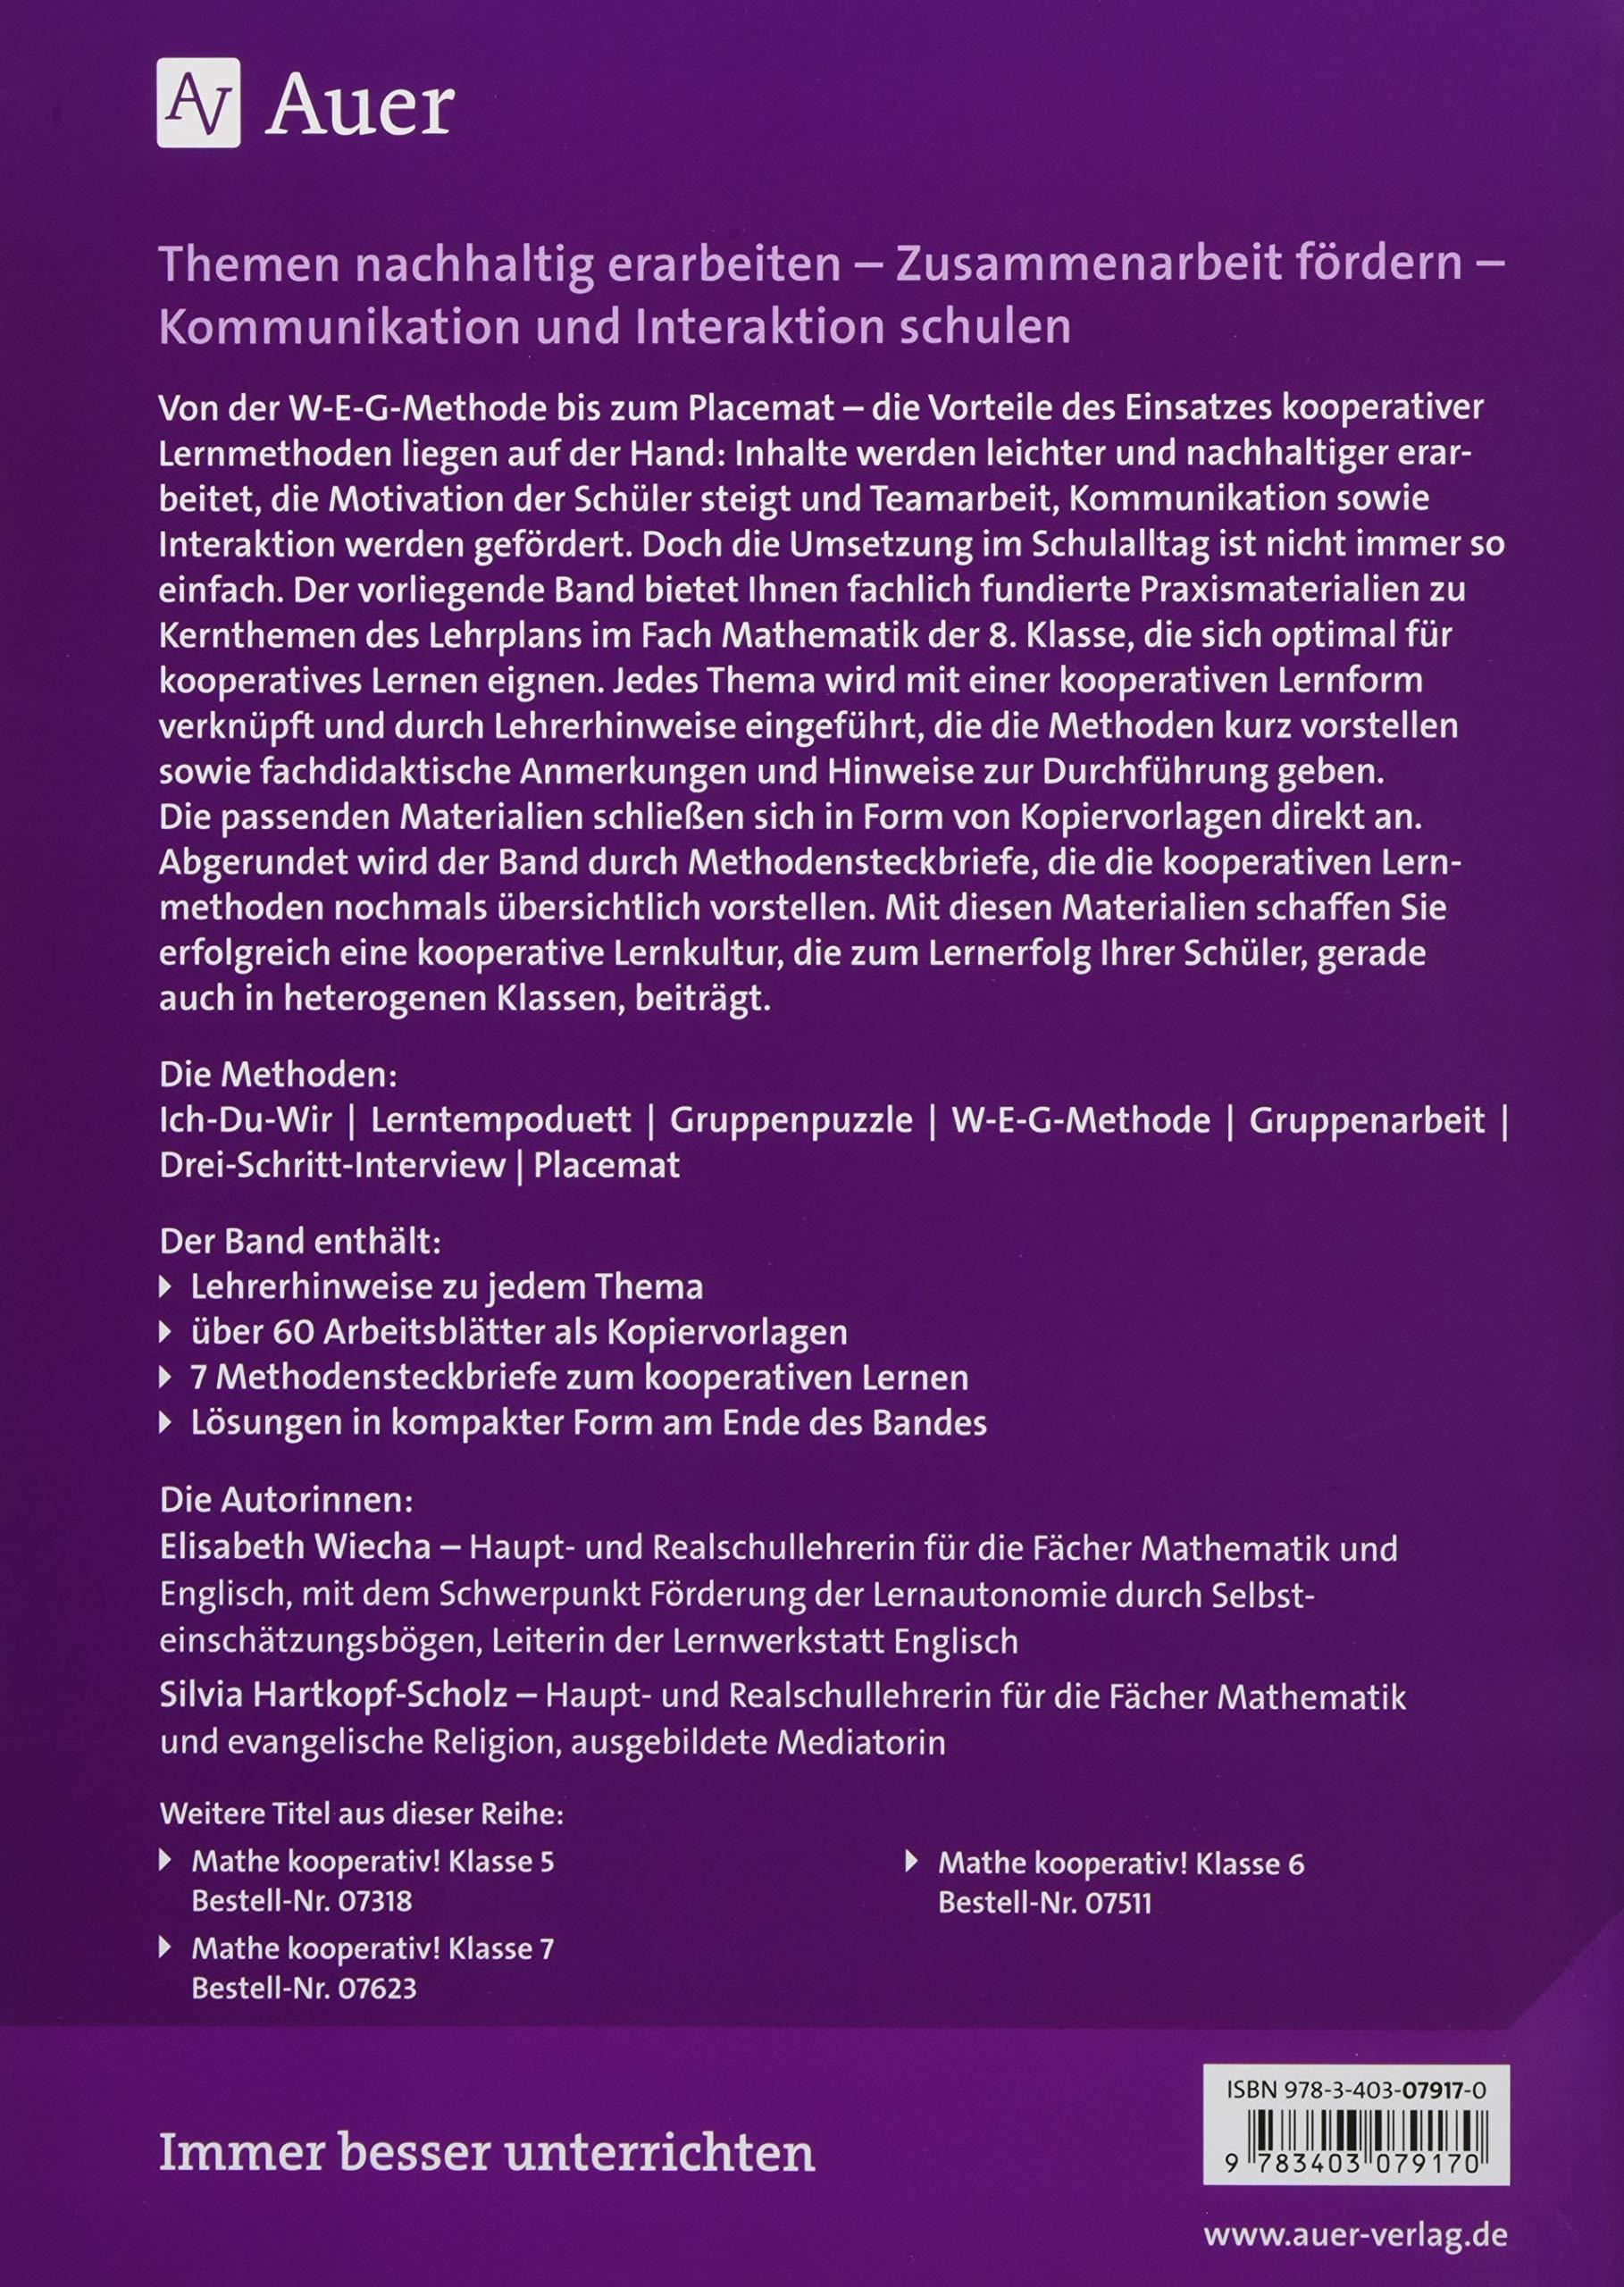 Mathe kooperativ Klasse 8: Kernthemen des Lehrplans mit kooperativen ...